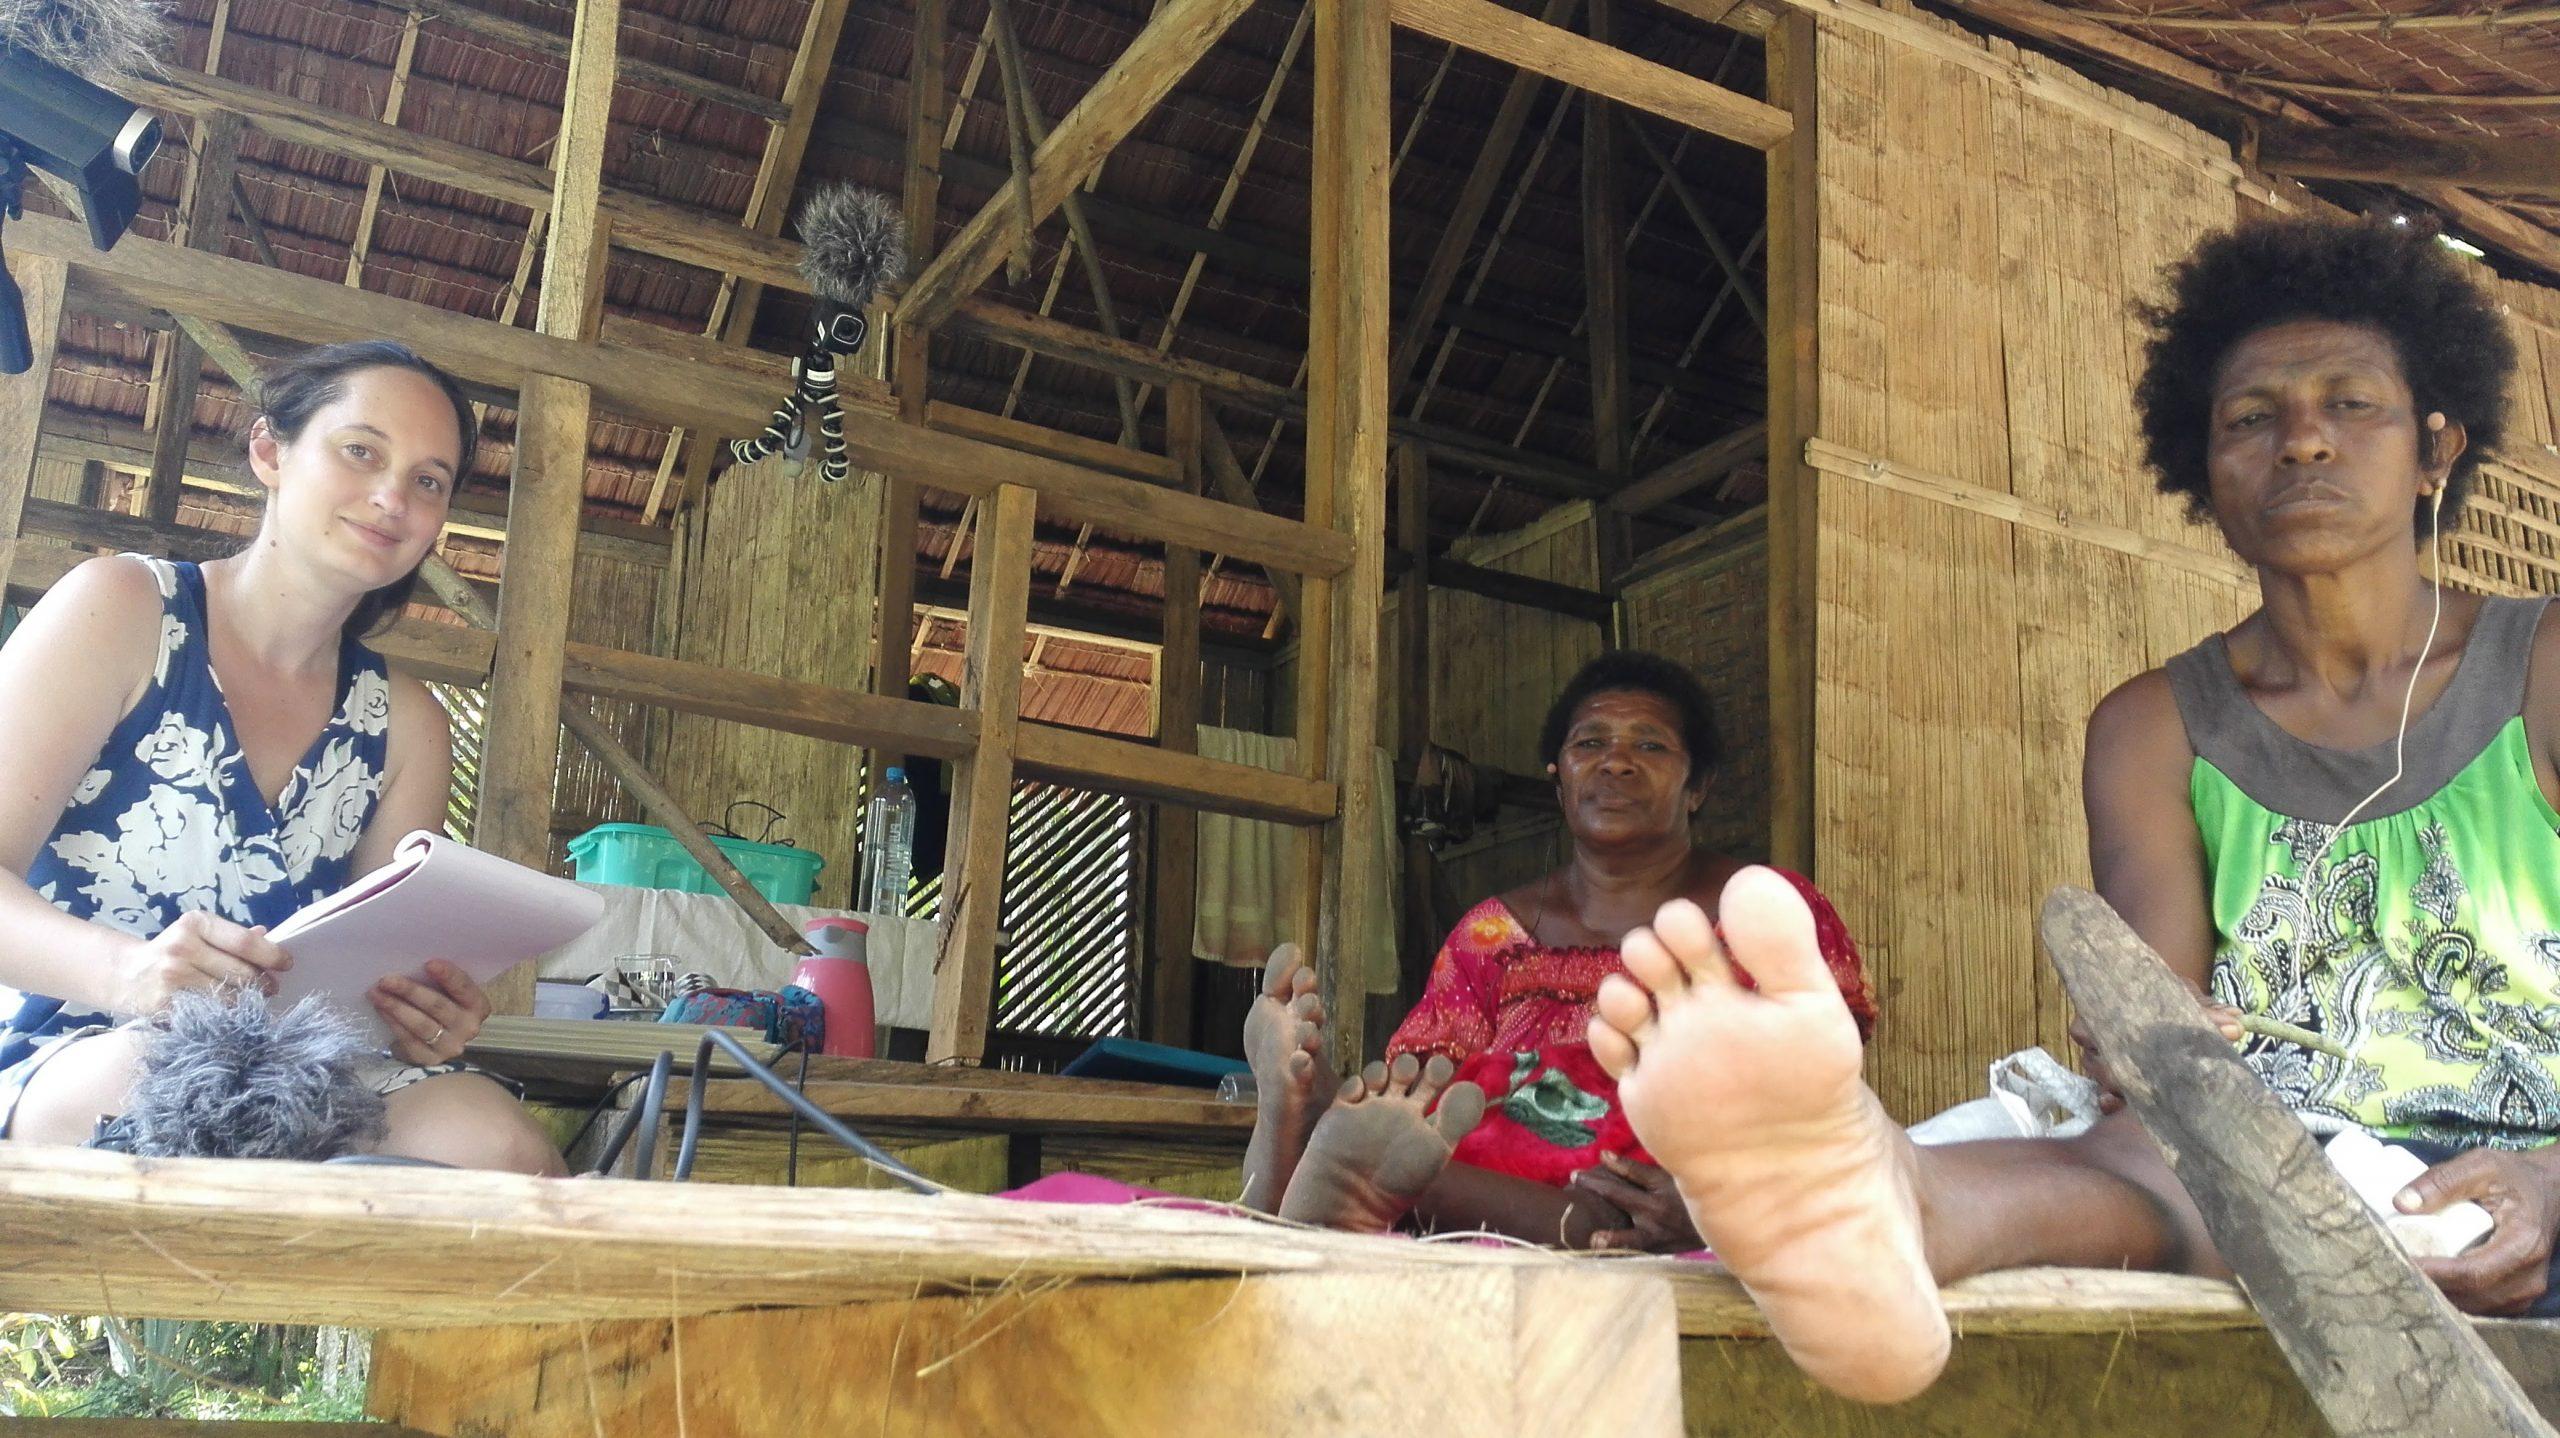 Three women sitting in in a Papuan stilt house. Danielle Barth (Left) interviews Matukar community members Rosa Kibis Dikoi (Centre) and Cathy Samun Wiliang (Right). Photo by Jillian Forepiso